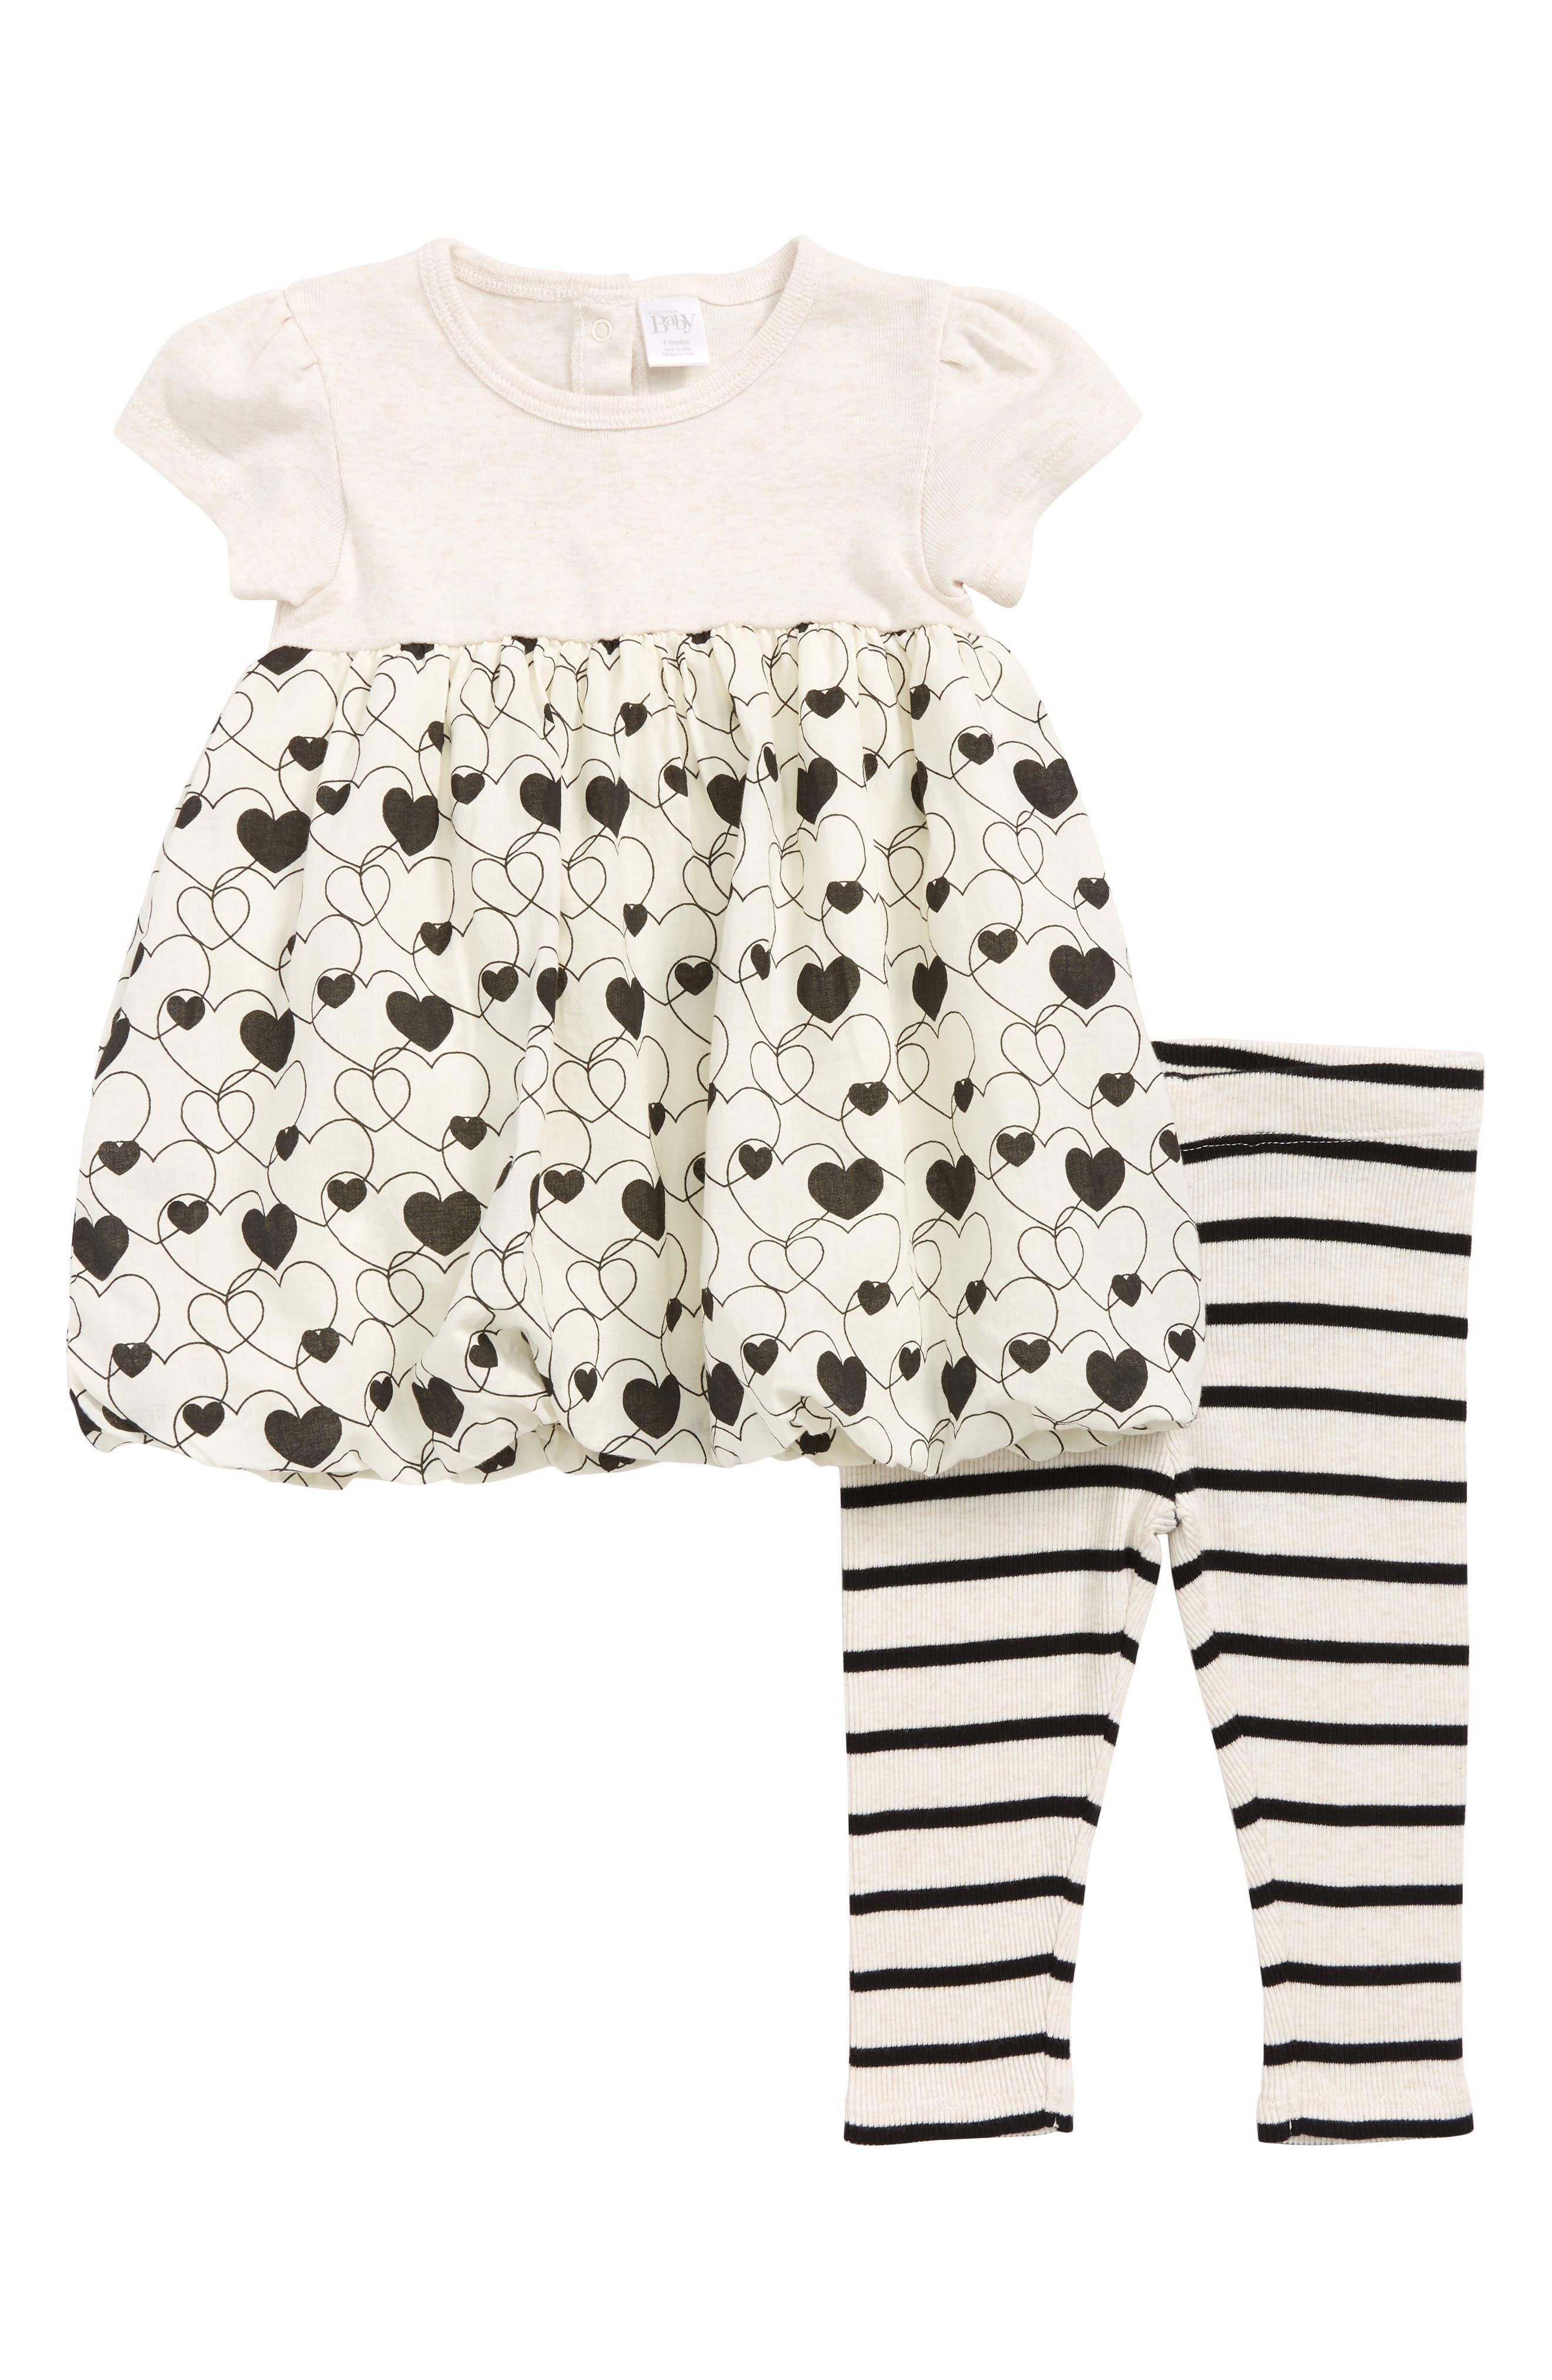 Dress & Leggings Set,                         Main,                         color, IVORY VANILLA HEARTS